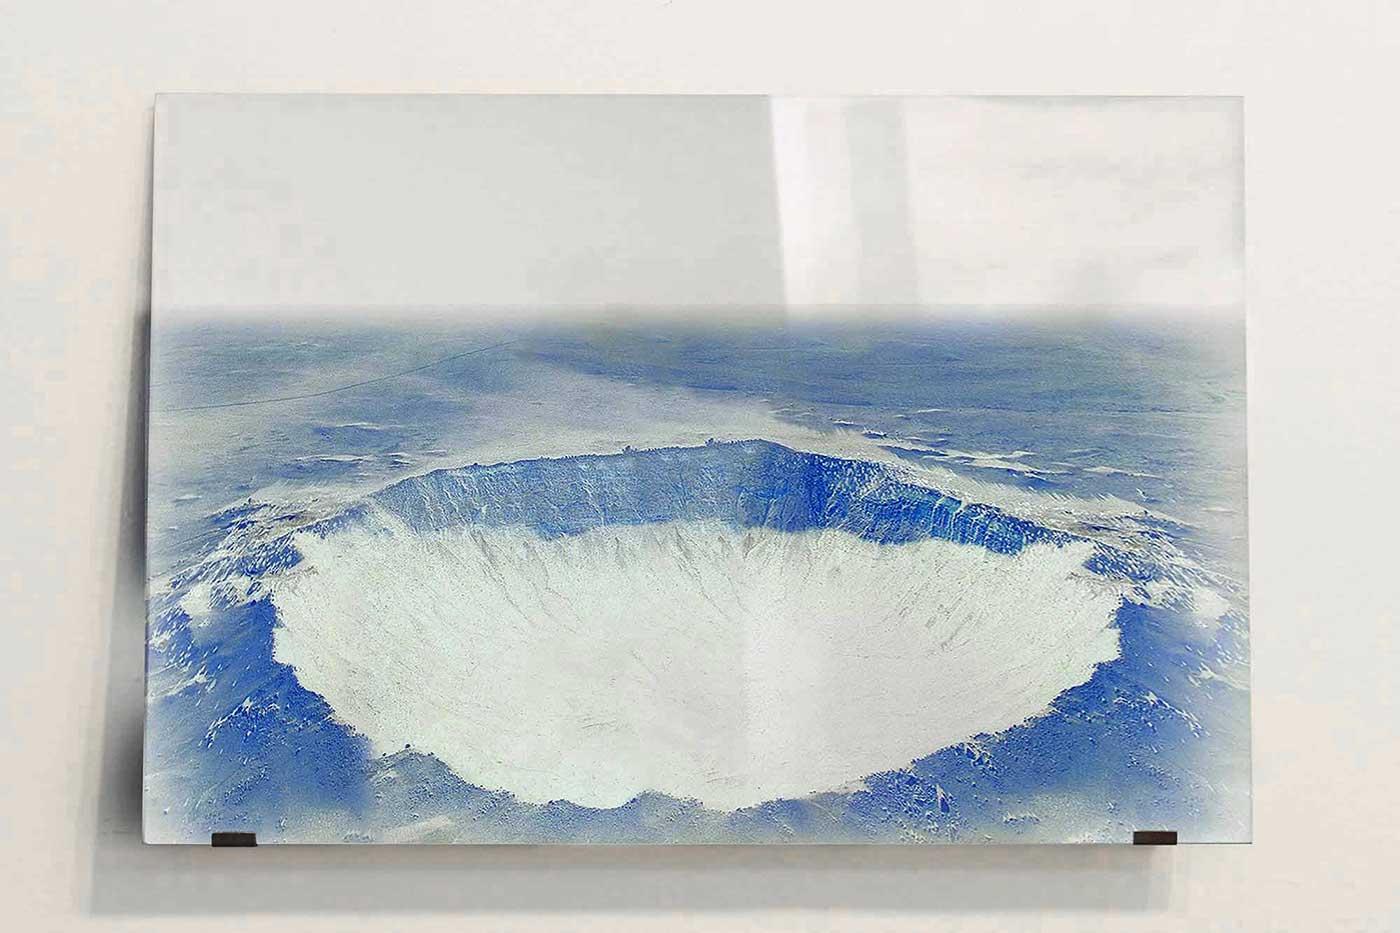 photographic print on glass cm 120 x 90 x 0,6. 2012